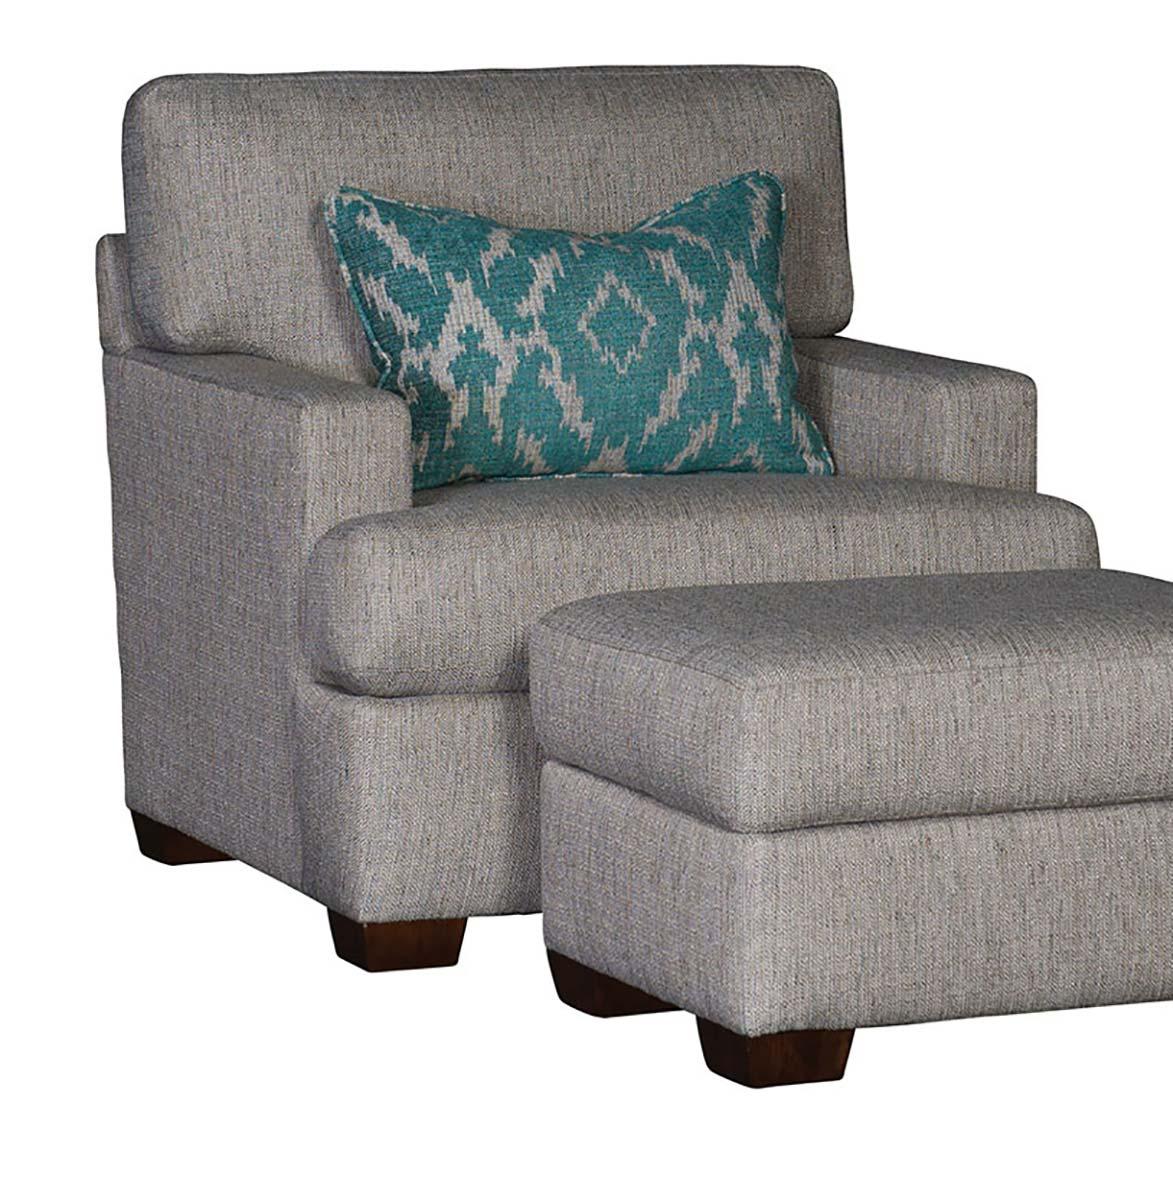 Chelsea Home Taunton Chair - Desiree Mushroom